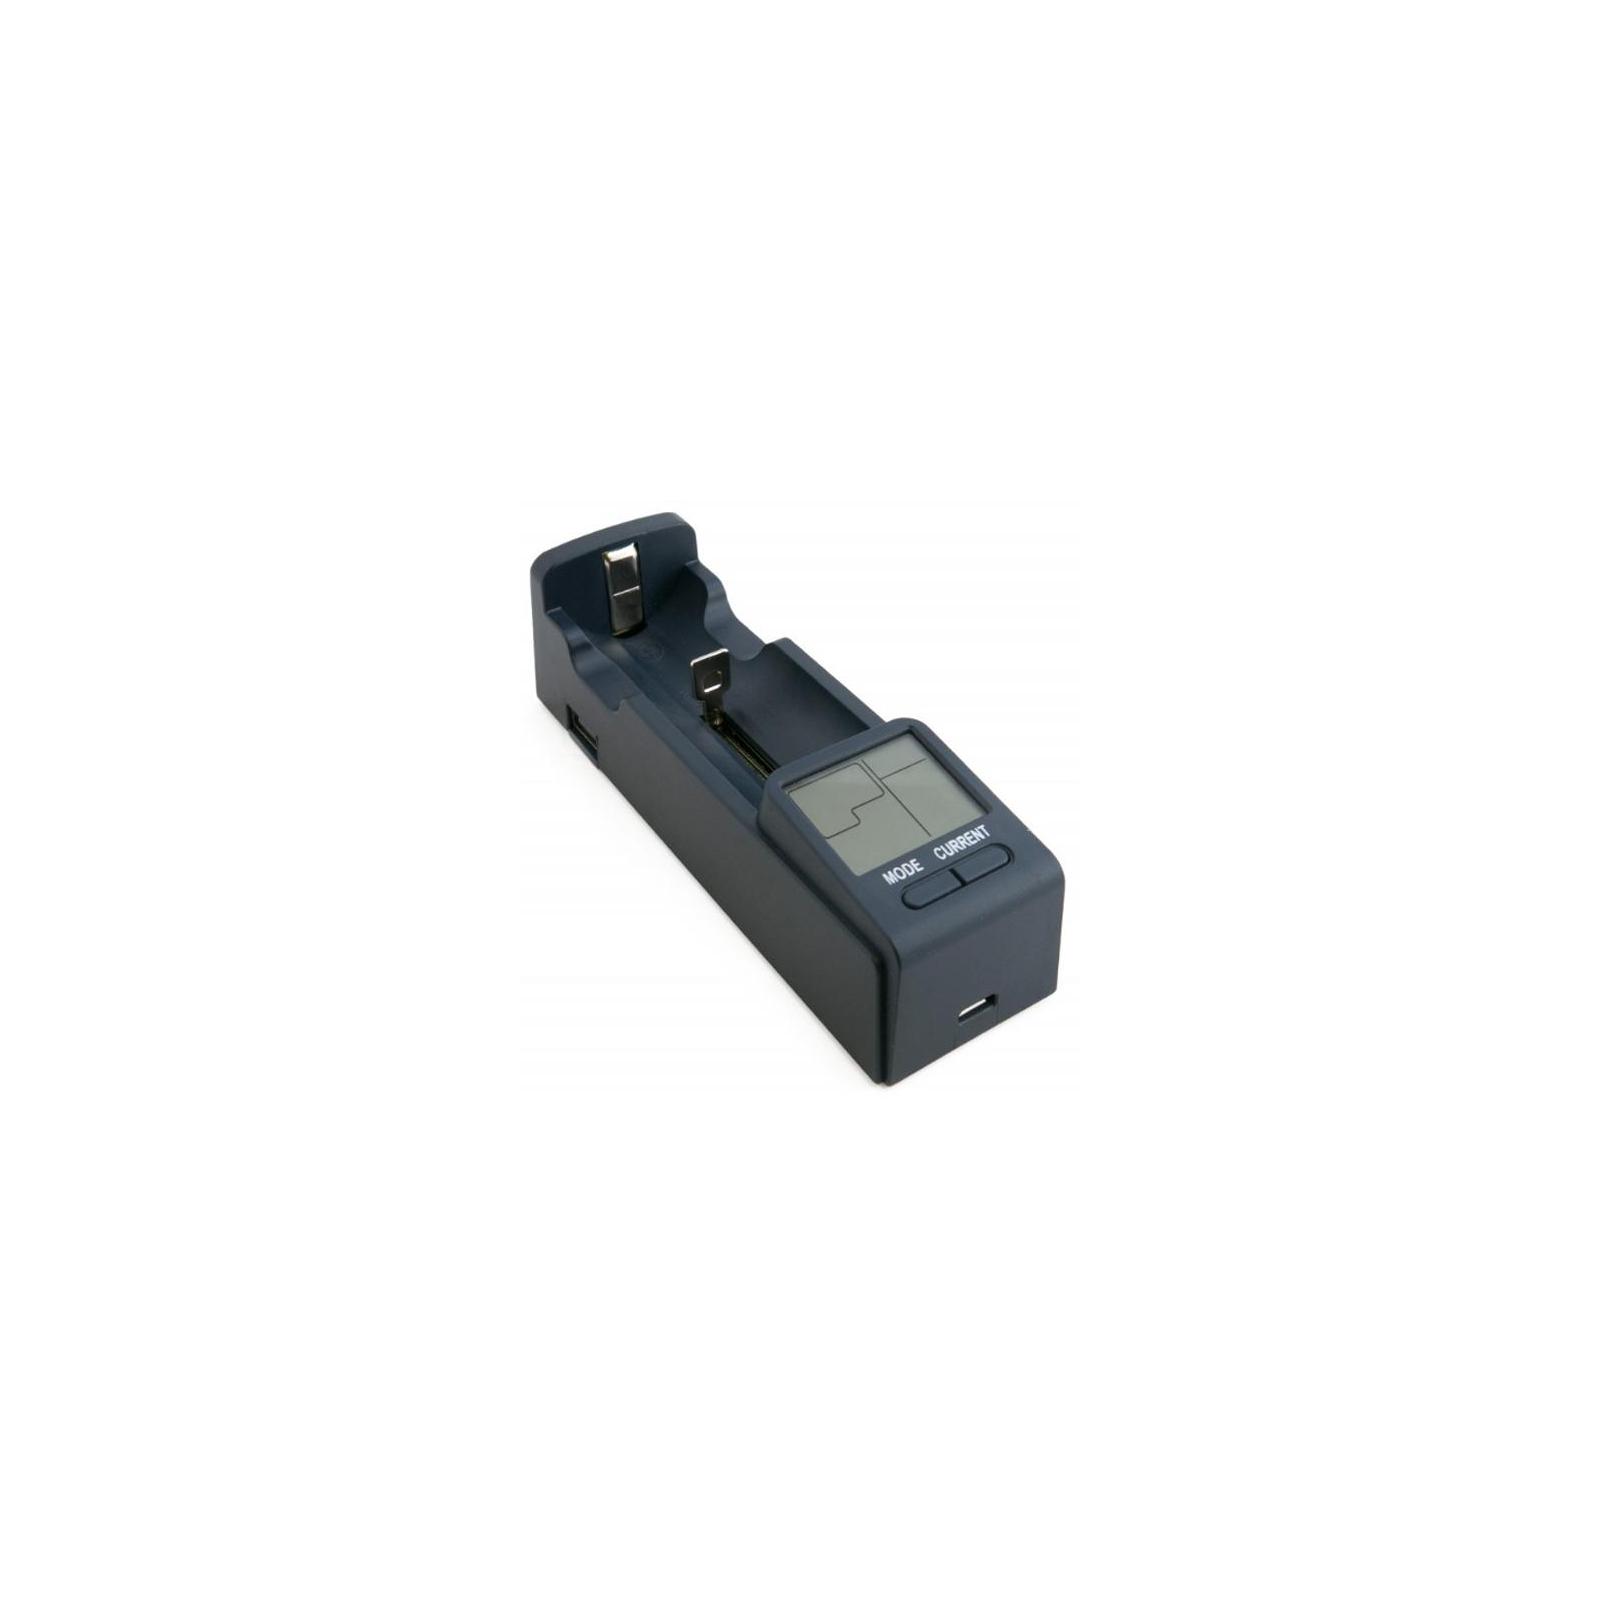 Зарядное устройство для аккумуляторов Extradigital BTC10 Travel 1slot Li-ion, Ni-MH, Ni-CD, LiFePO4 (AAC2832) изображение 3